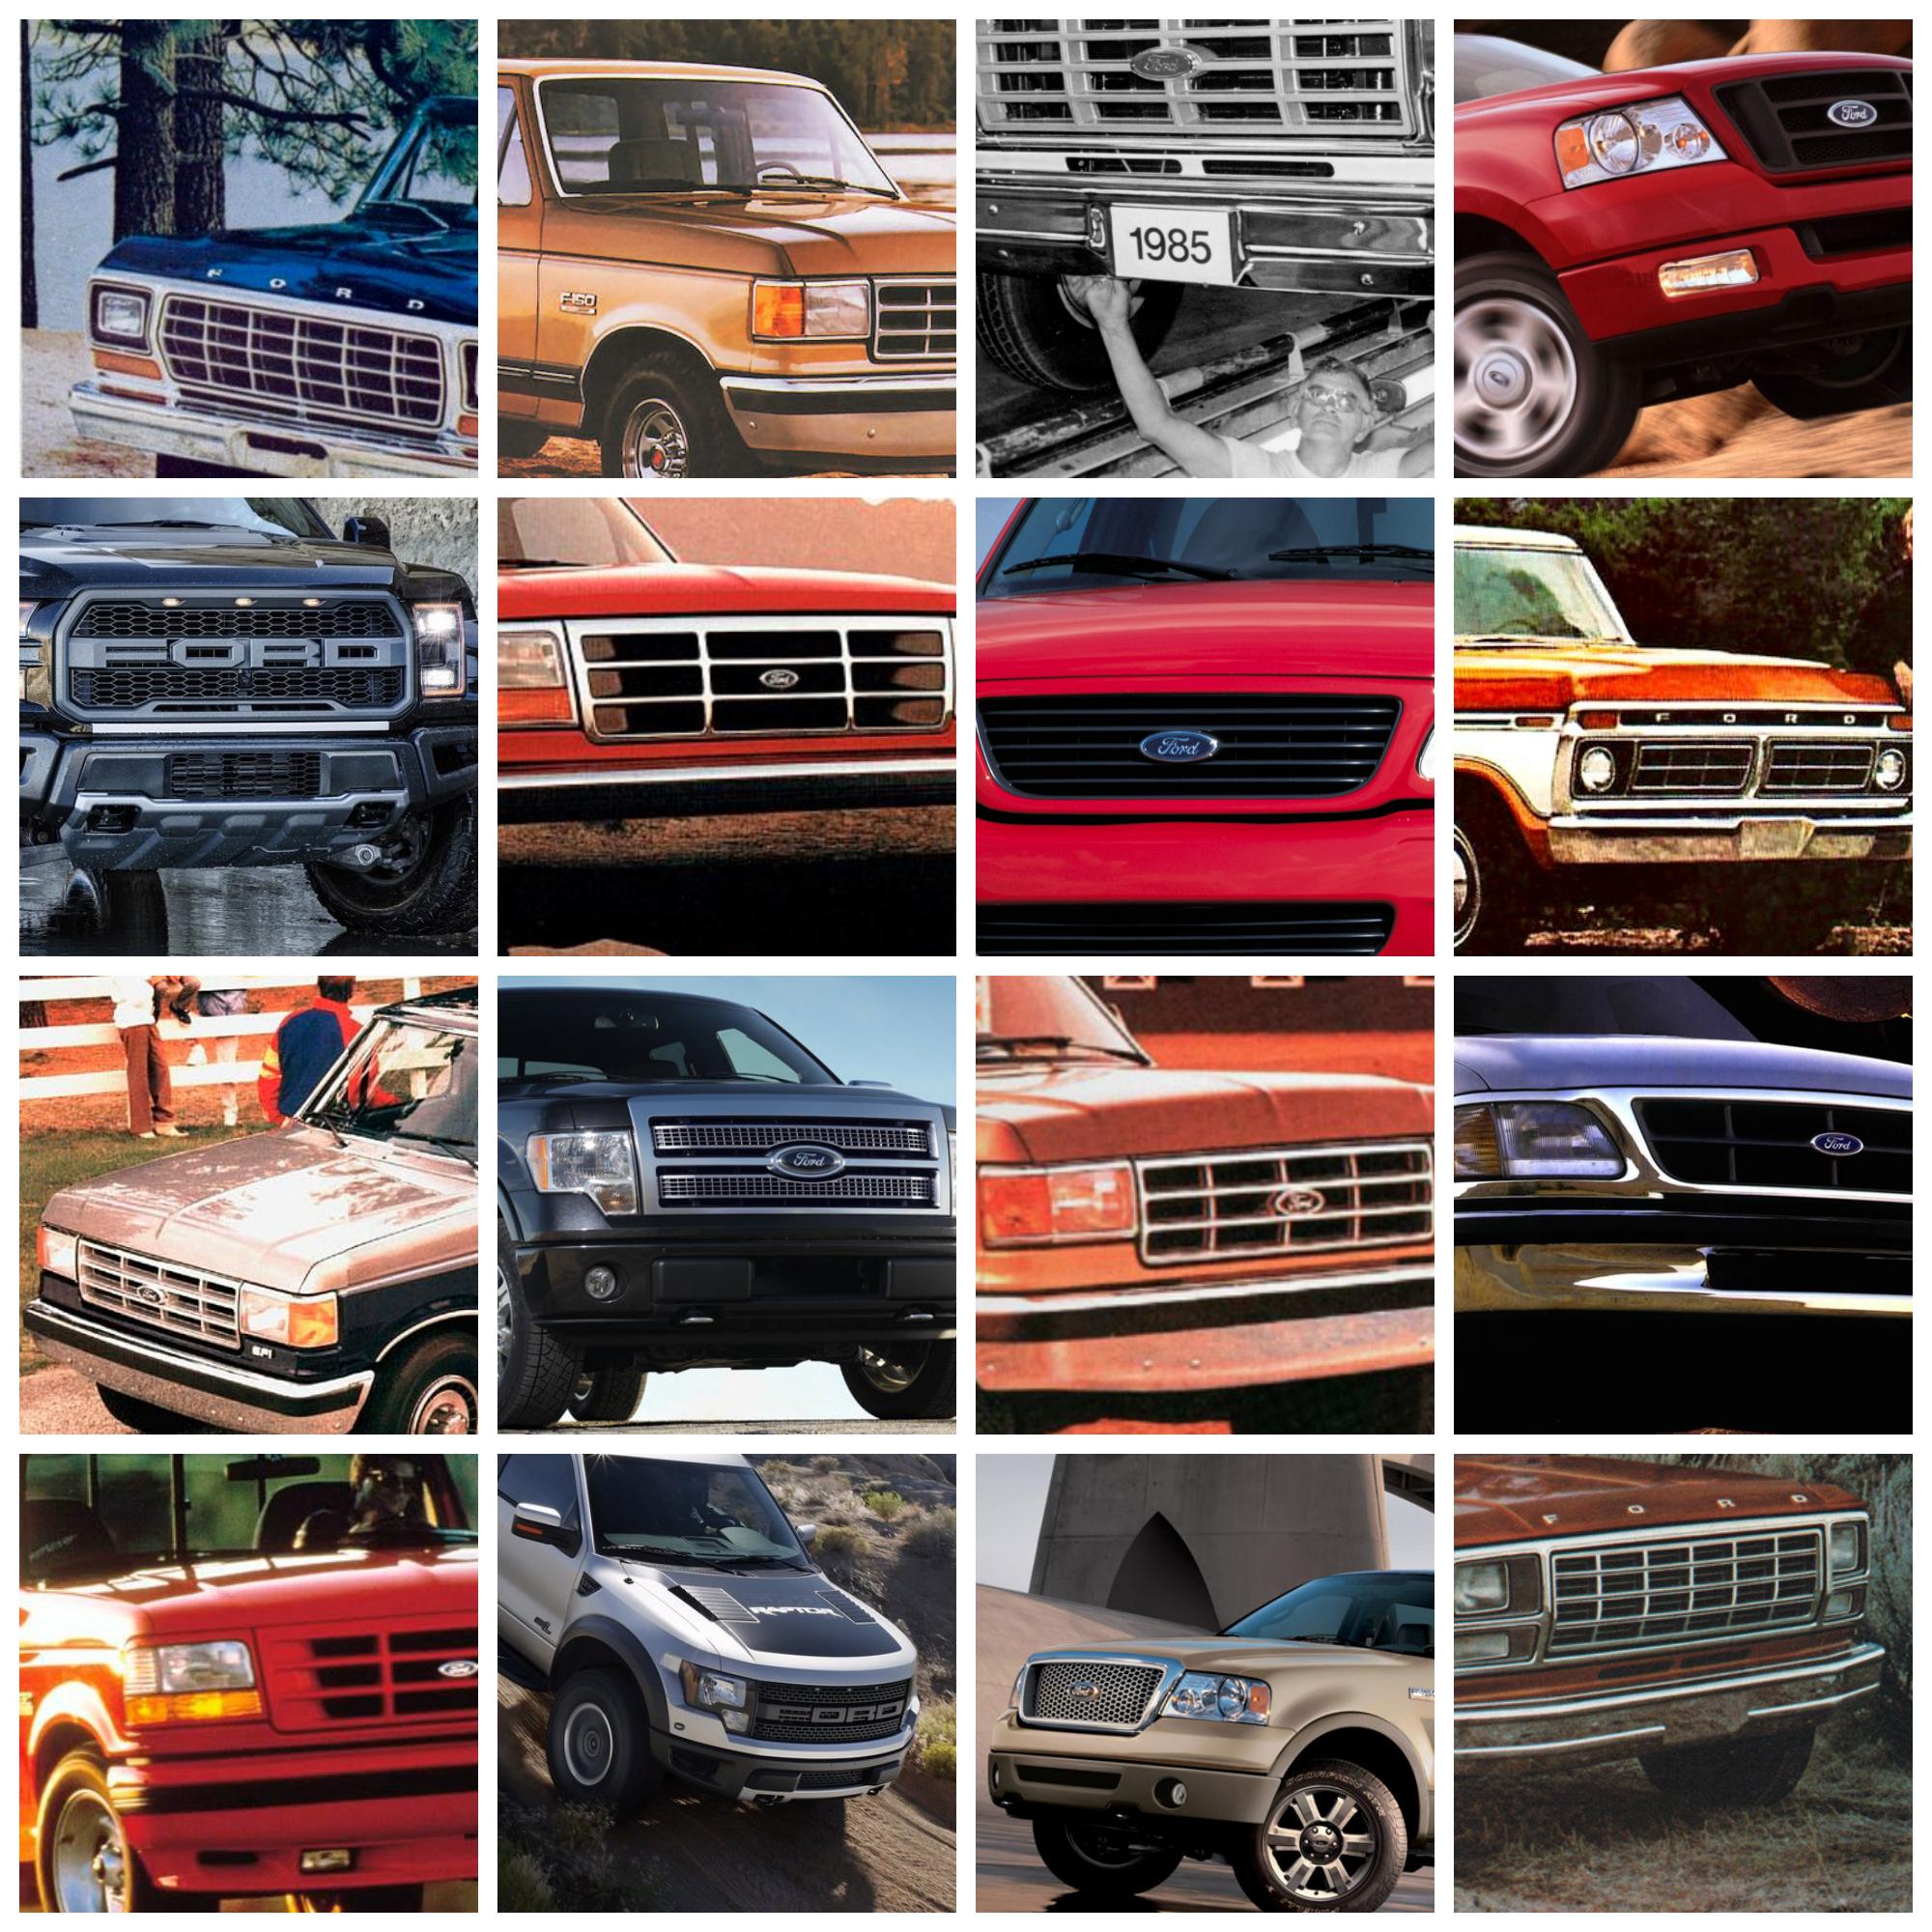 Amar A Muerte Capitulo 40: La Ford Serie-F Cumple 40 Años Como La Línea De Pickups